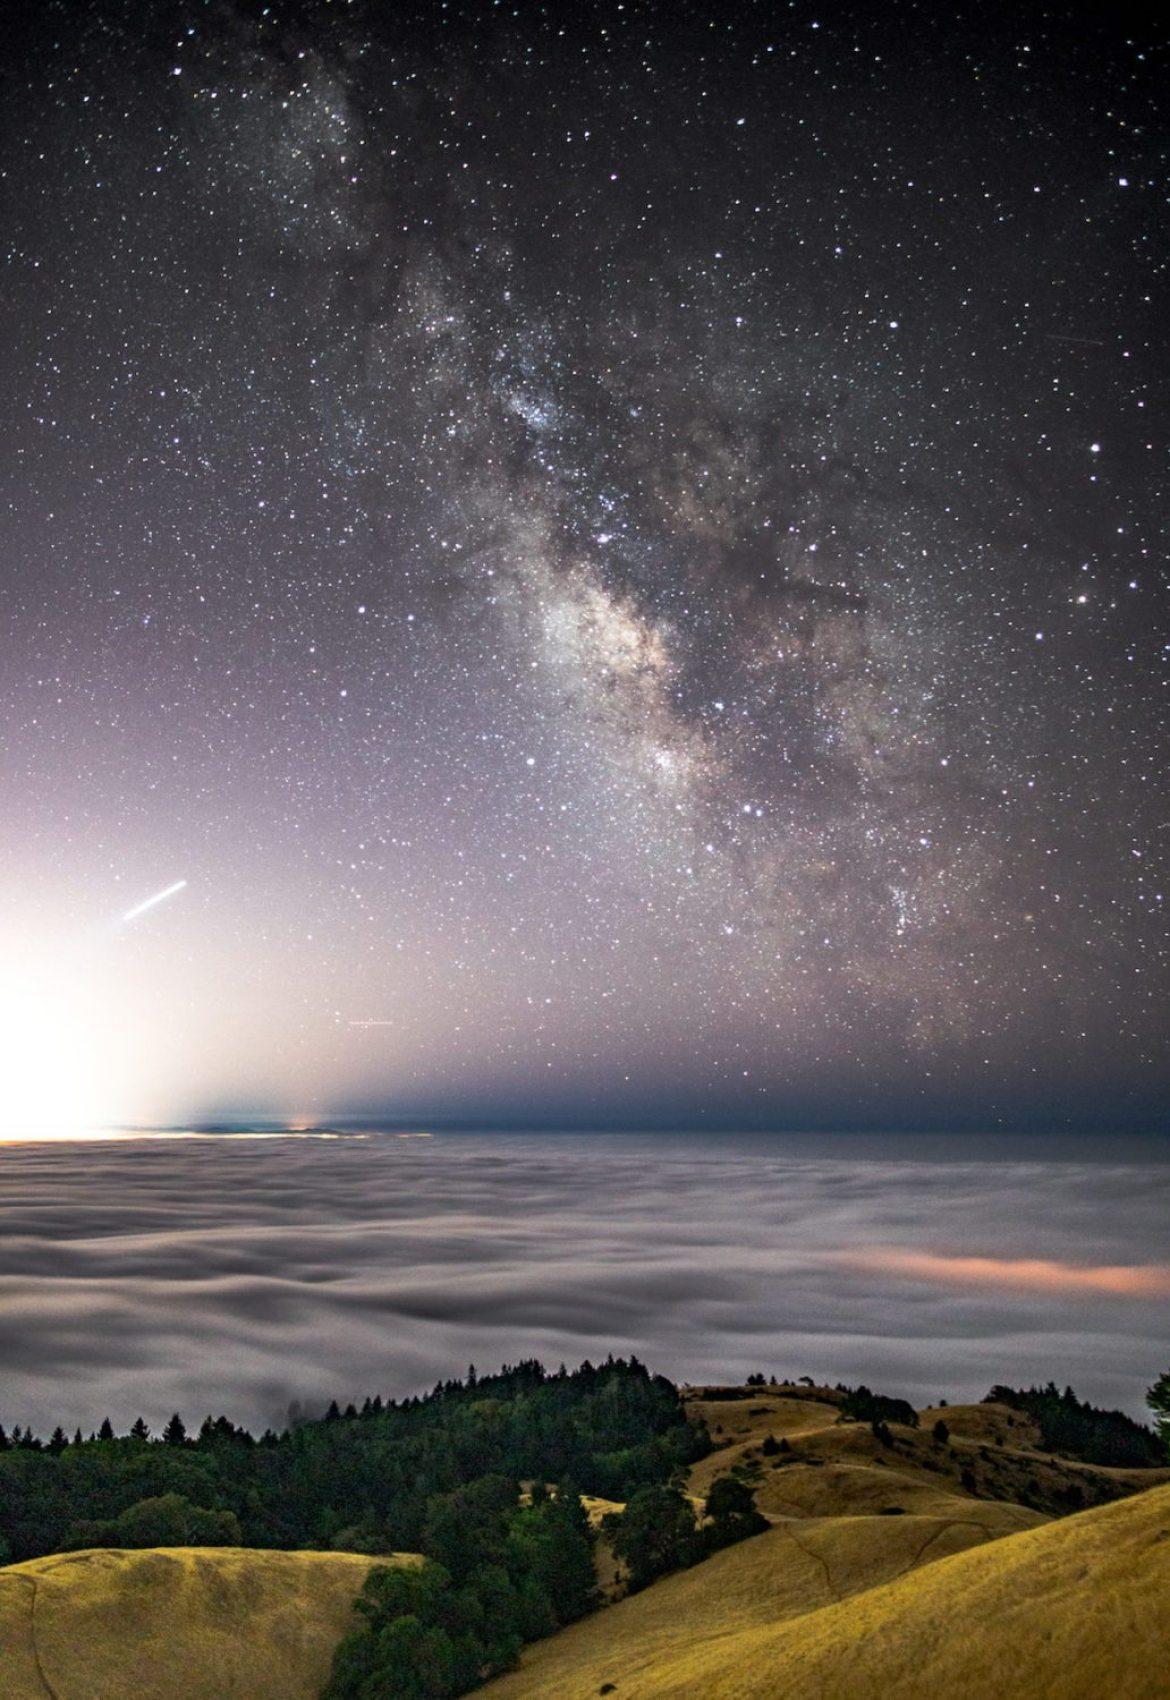 """My favorite pic. Taken last summer up on Mt. Tam over the fog."" Photo: Jake Landon, @jakelandon. #SFGuide Featured Photographer."